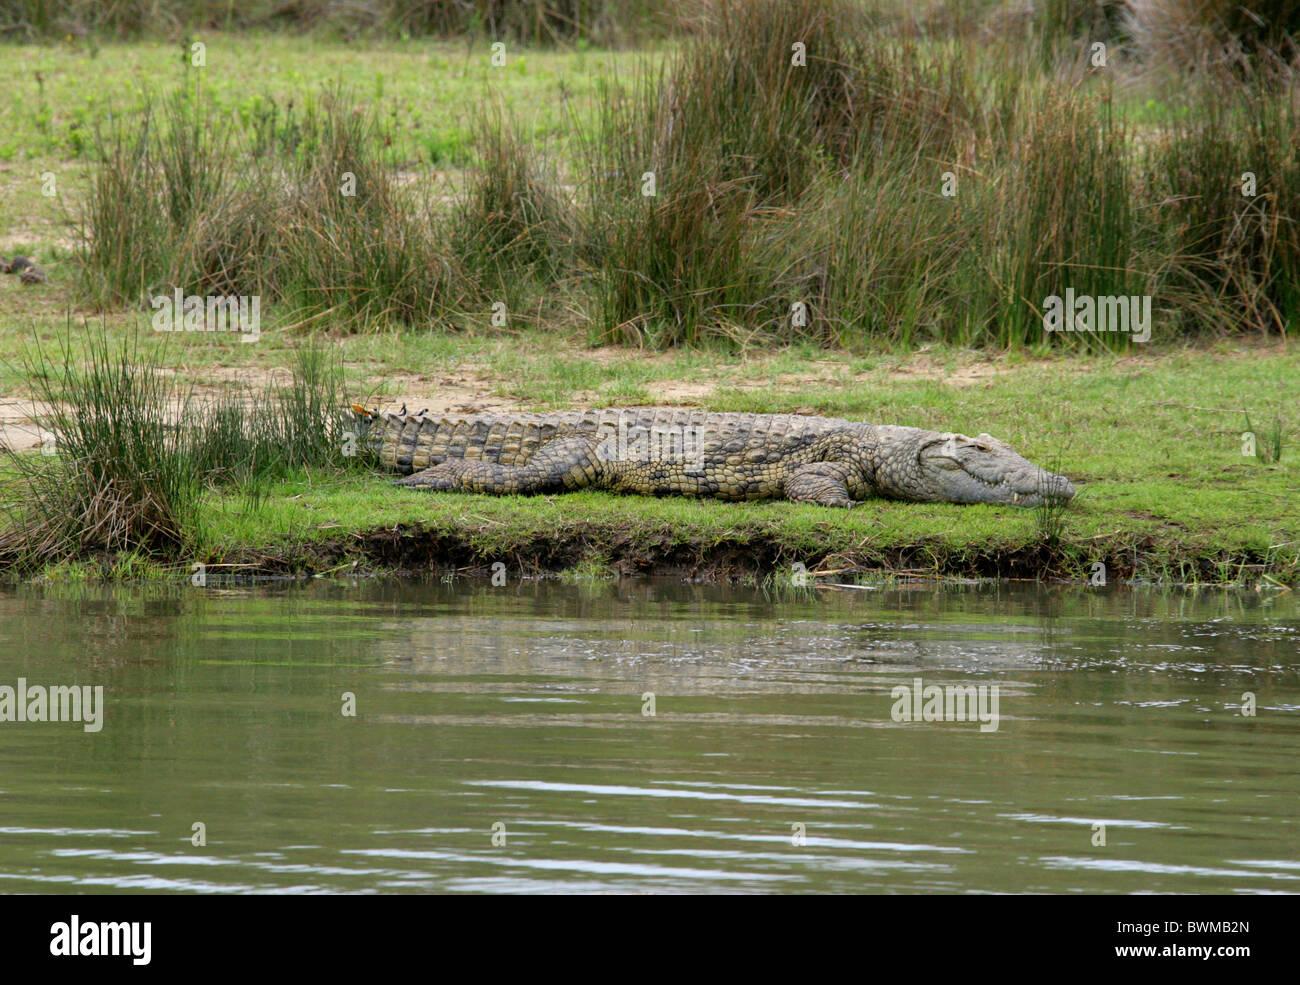 Nile Crocodile, Crocodylus niloticus, Crocodylidae. St Lucia Wetlands Park, KwaZulu Natal, South Africa. - Stock Image